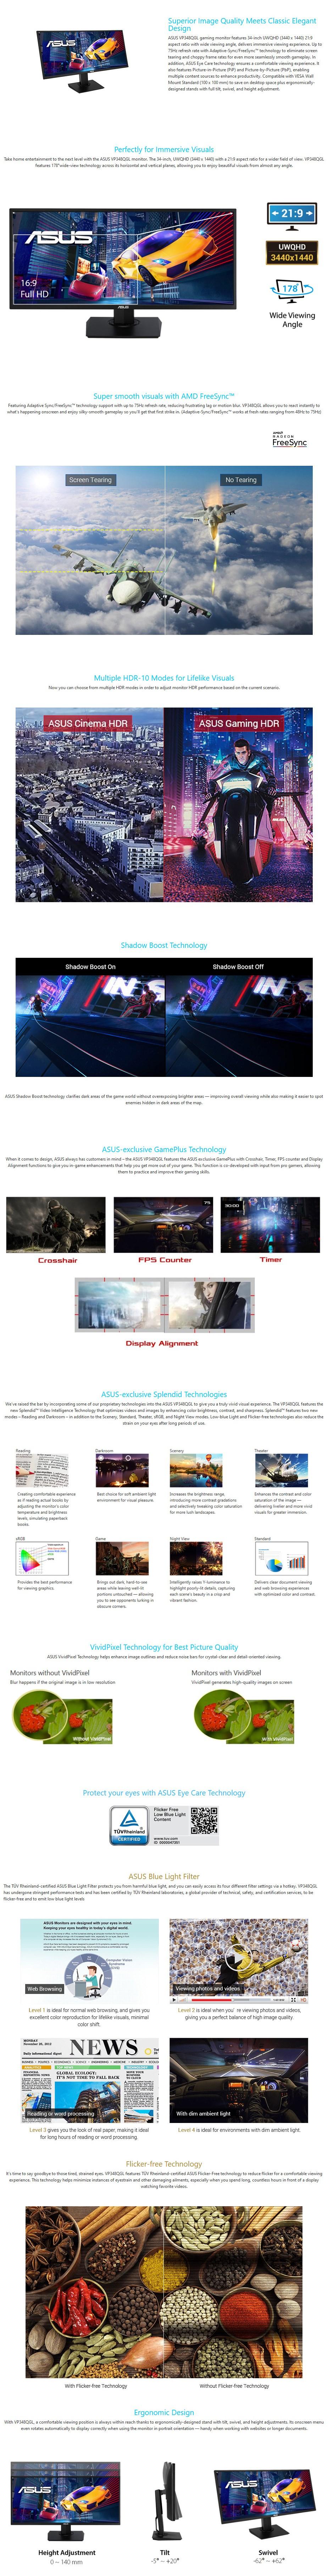 asus-vp348qgl-34-75hz-ultrawide-qhd-hdr-freesync-gaming-monitor-ac34964-8.jpg